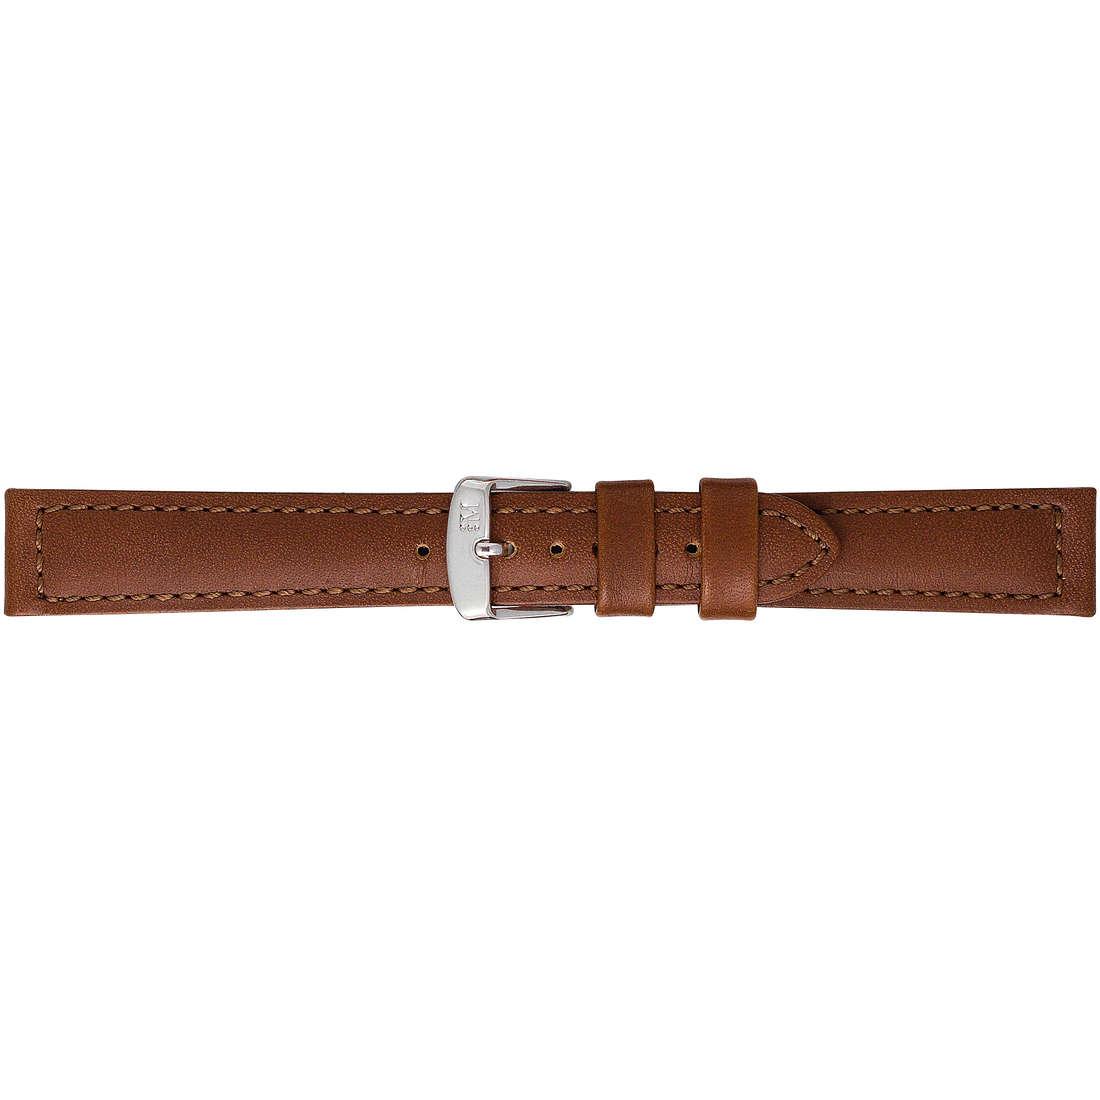 watch watch bands watch straps man Morellato Manufatti A01U2226364034CR24